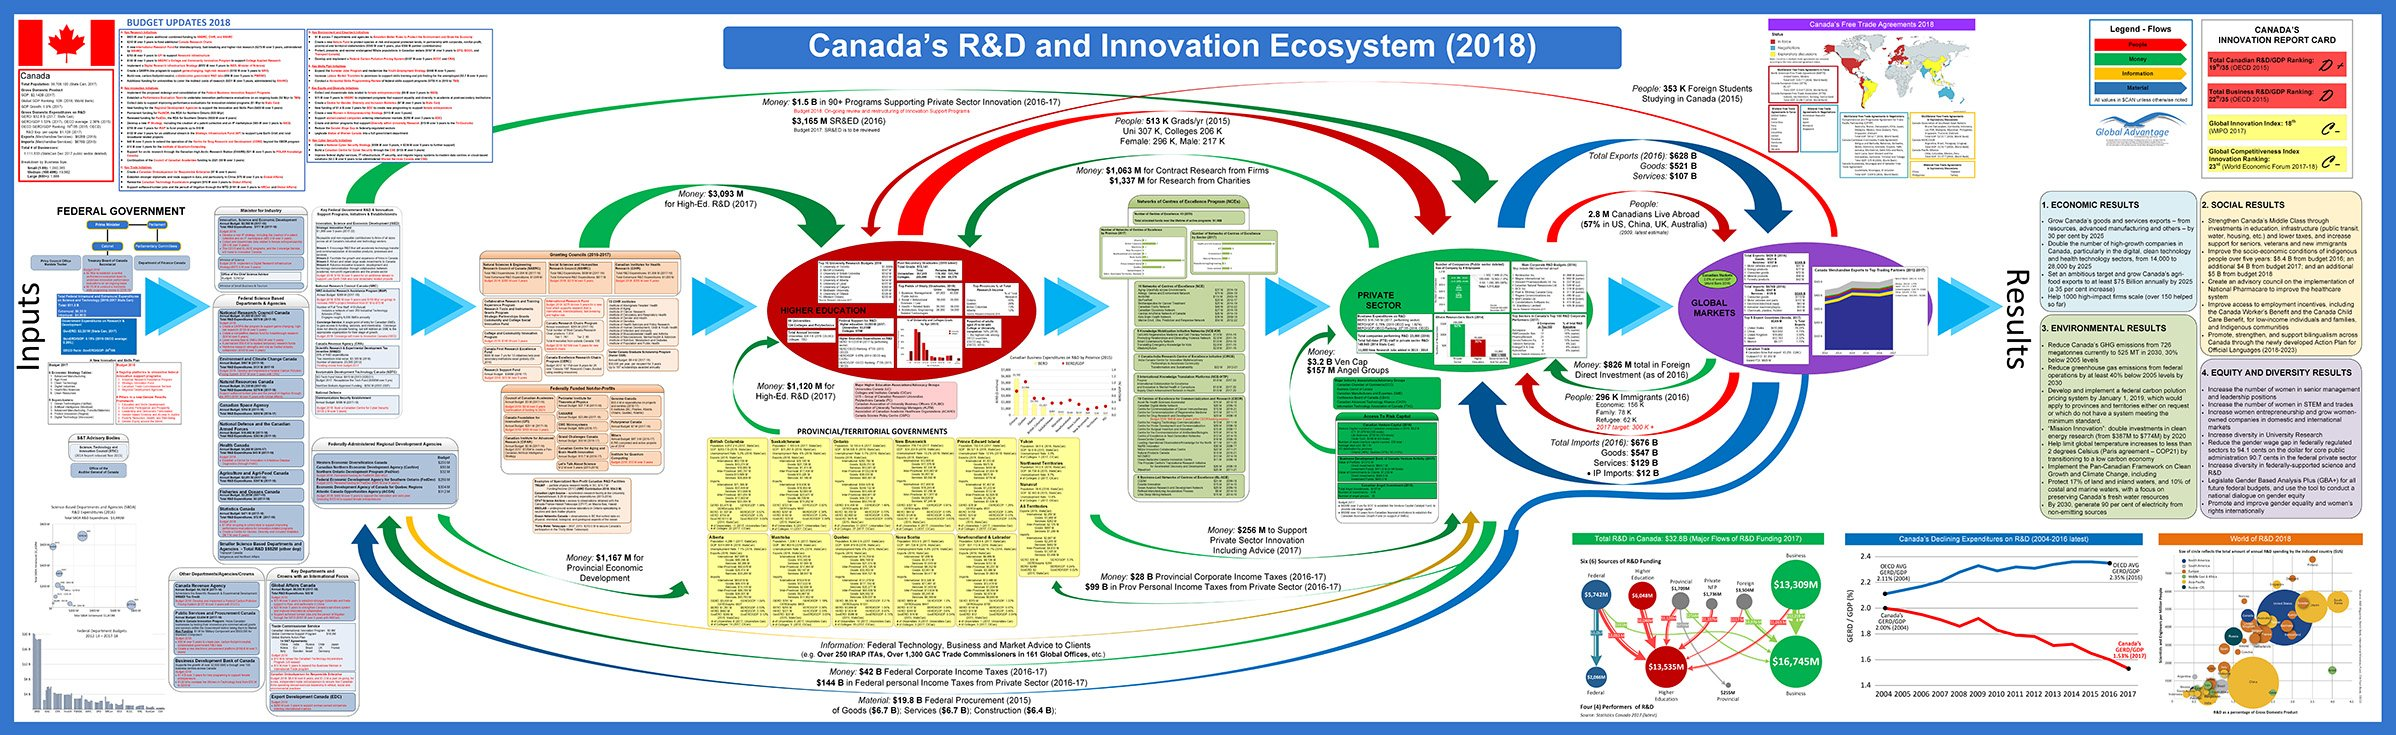 2018 Canada Innovation Ecosystem Map